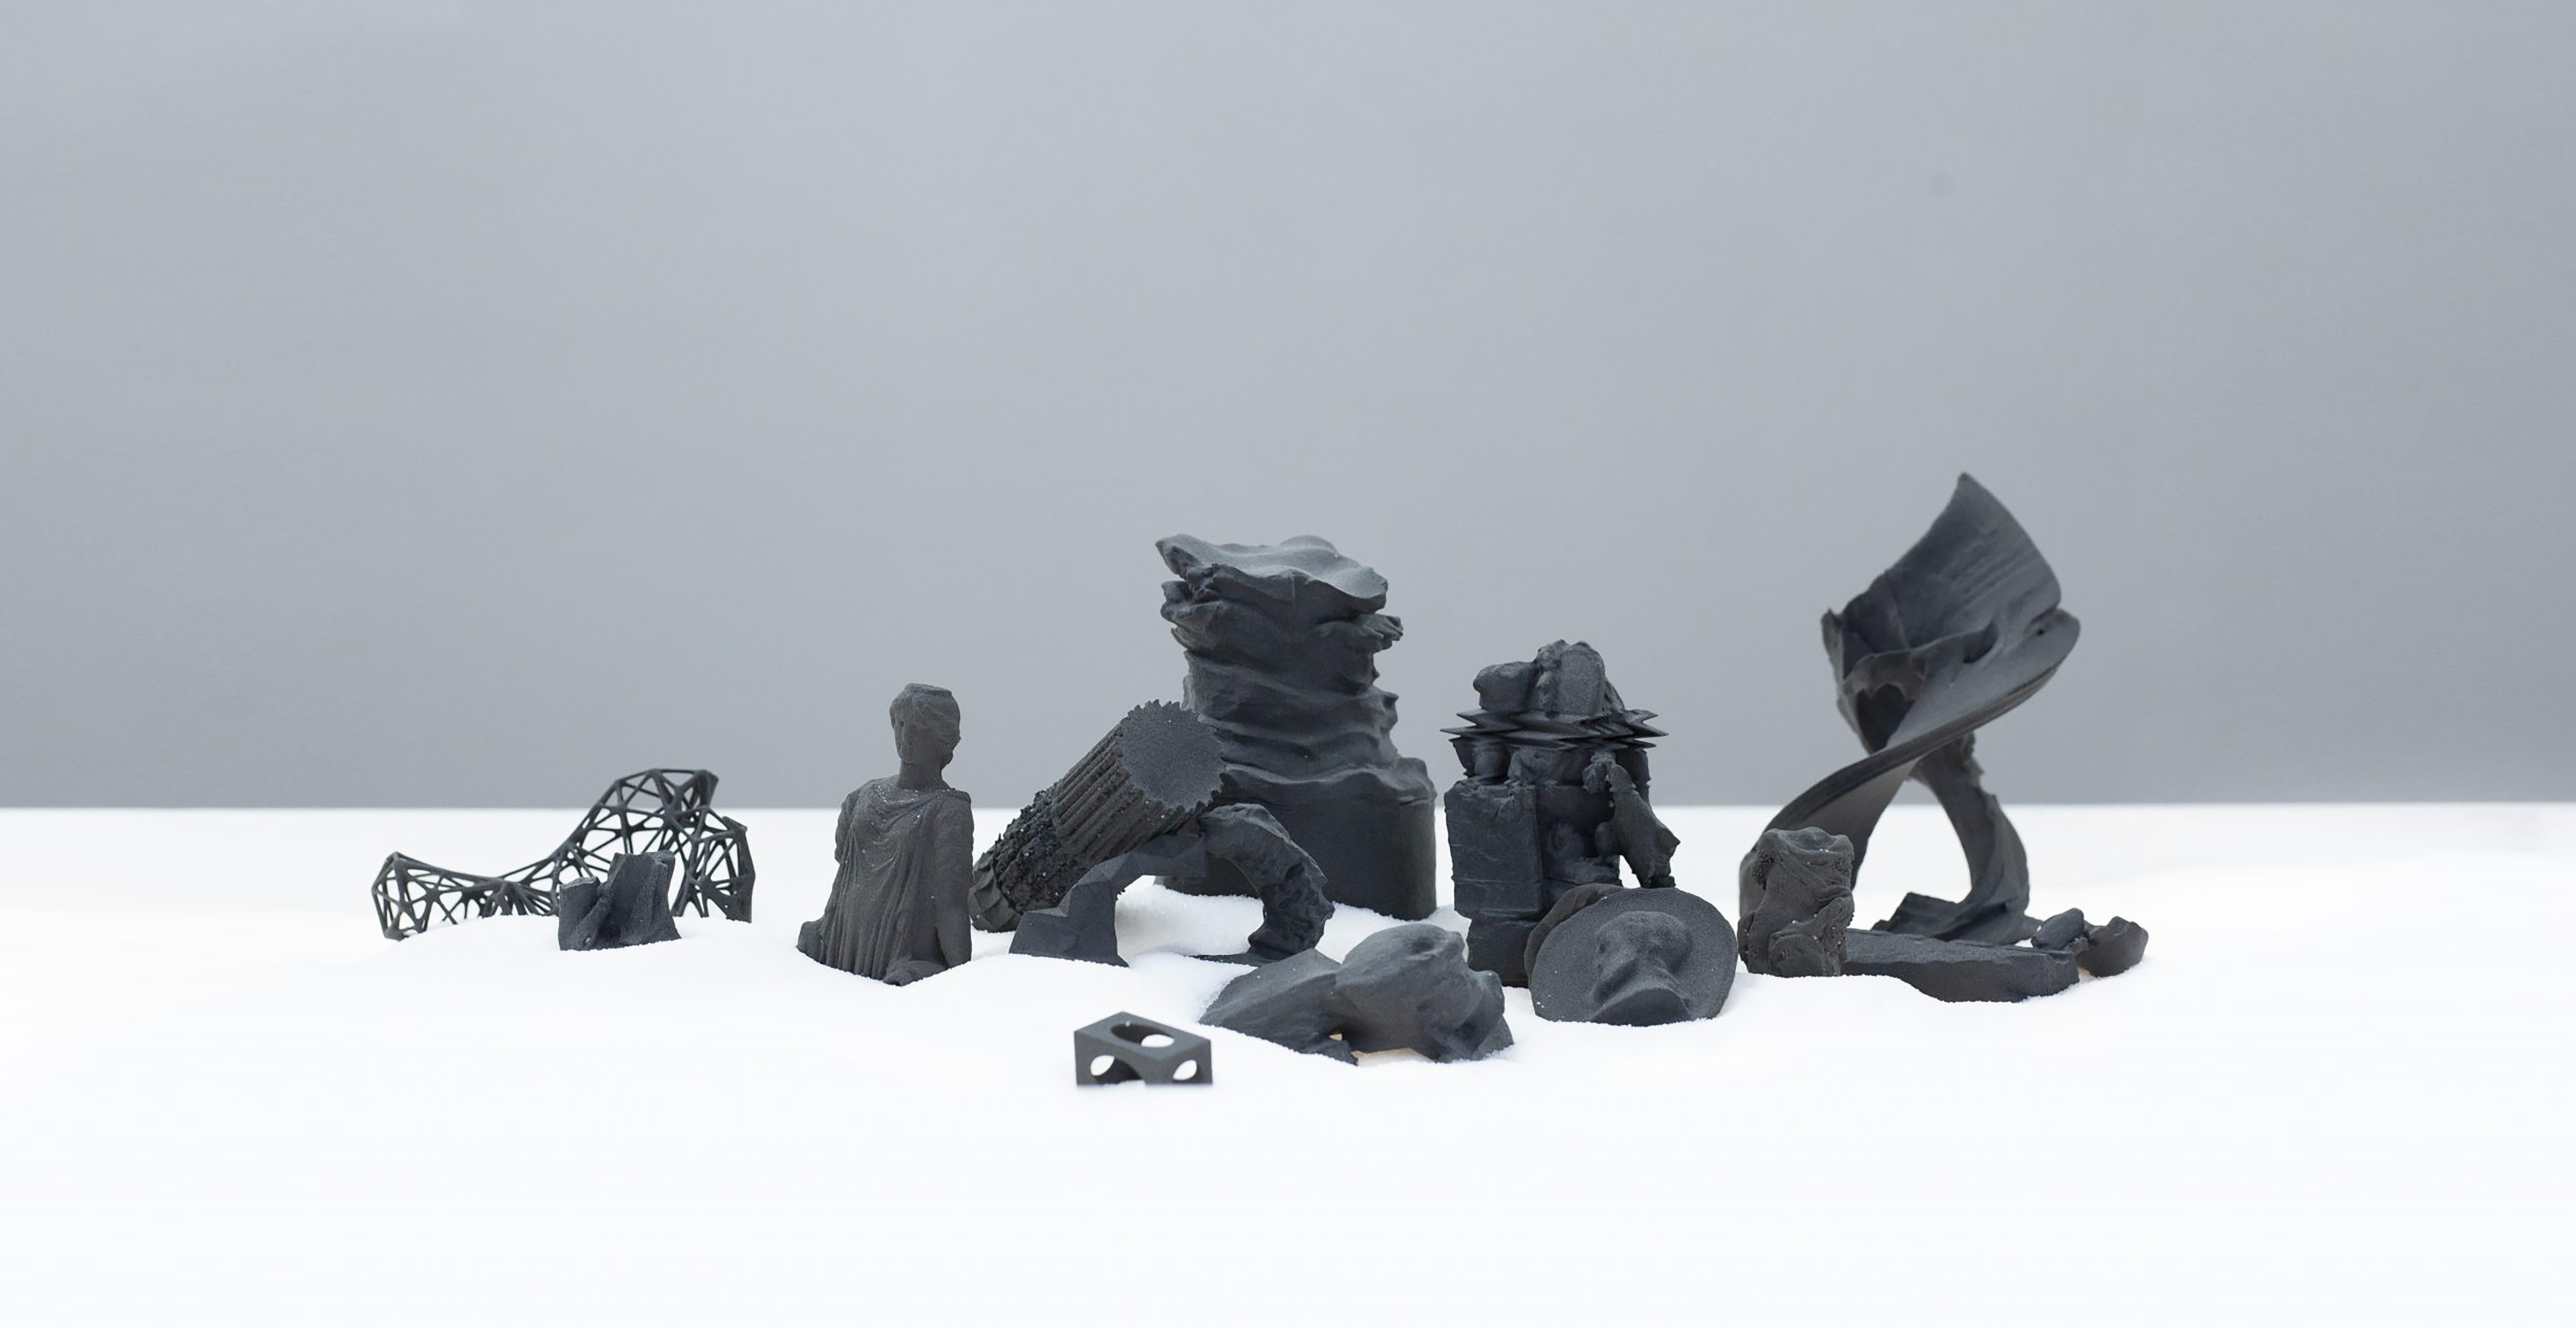 KNH-Shorts #3: Julia Cremers, Lena Kocutar, Daniel Viladrich